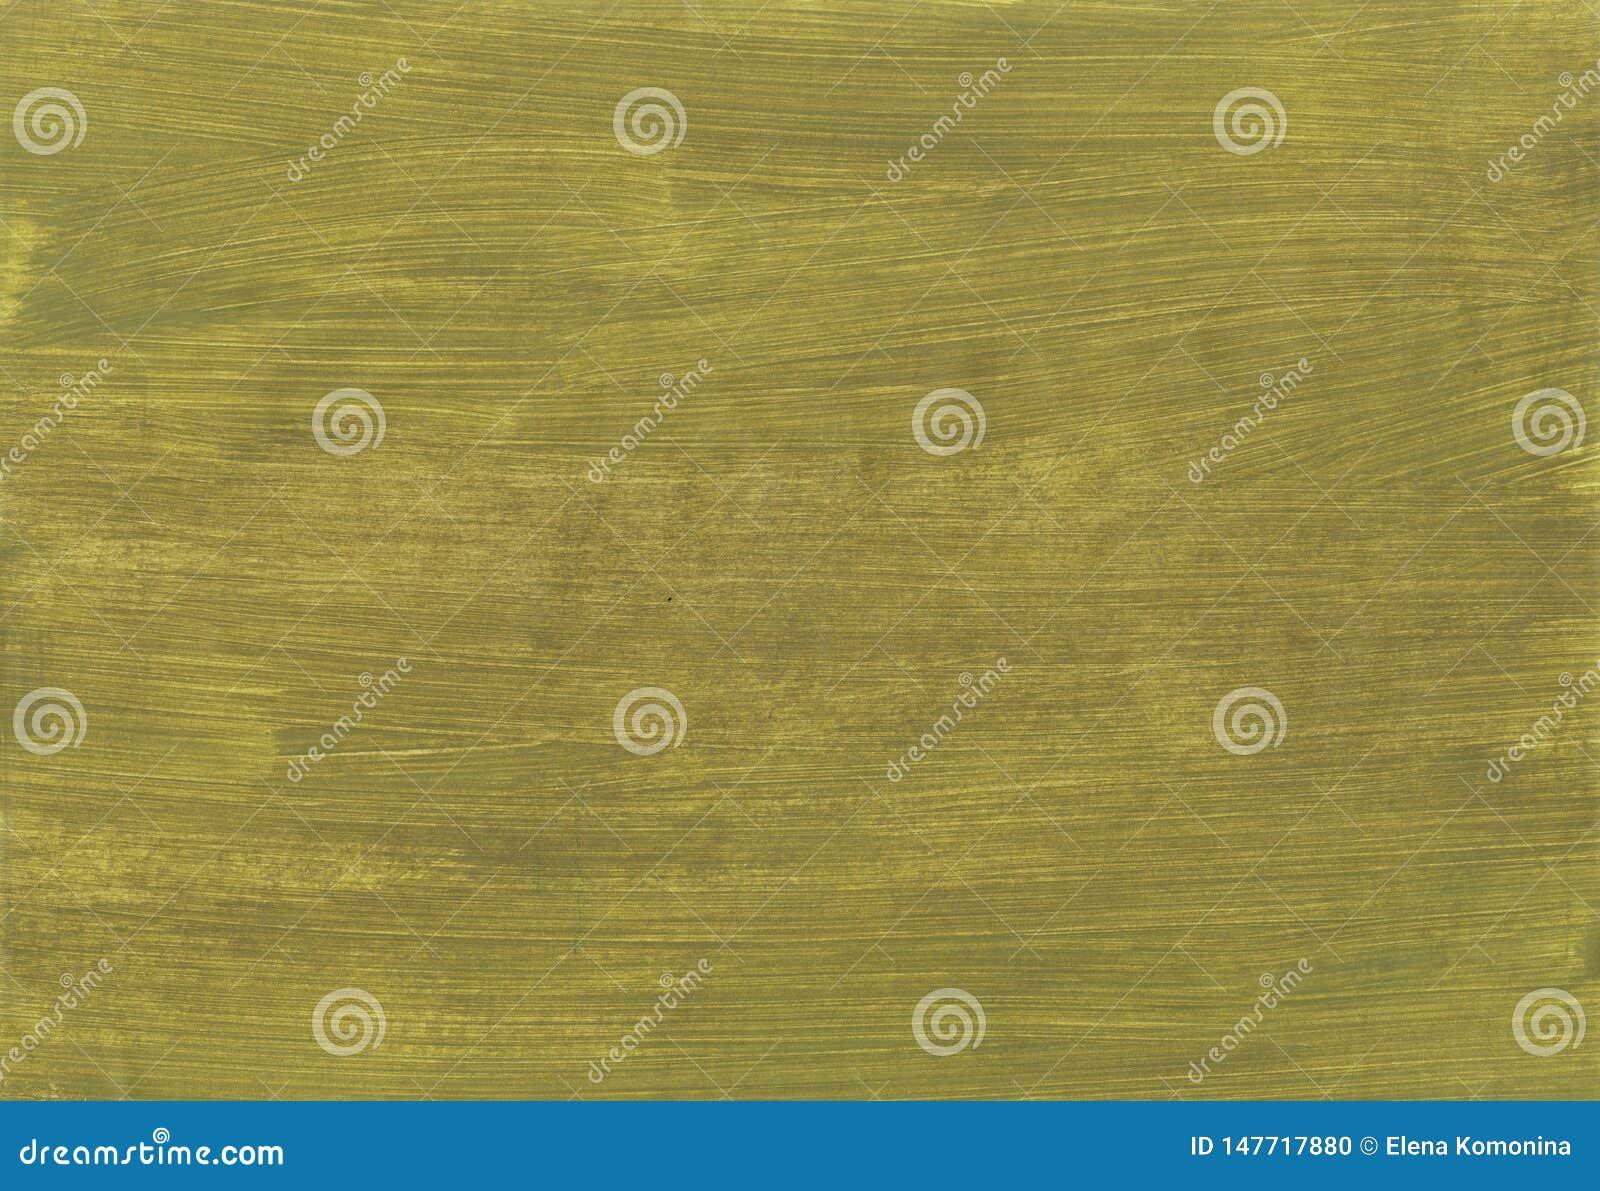 Hintergrund des olivgr?nen Gr?ns Olive oder Lorbeer verlässt Farbe